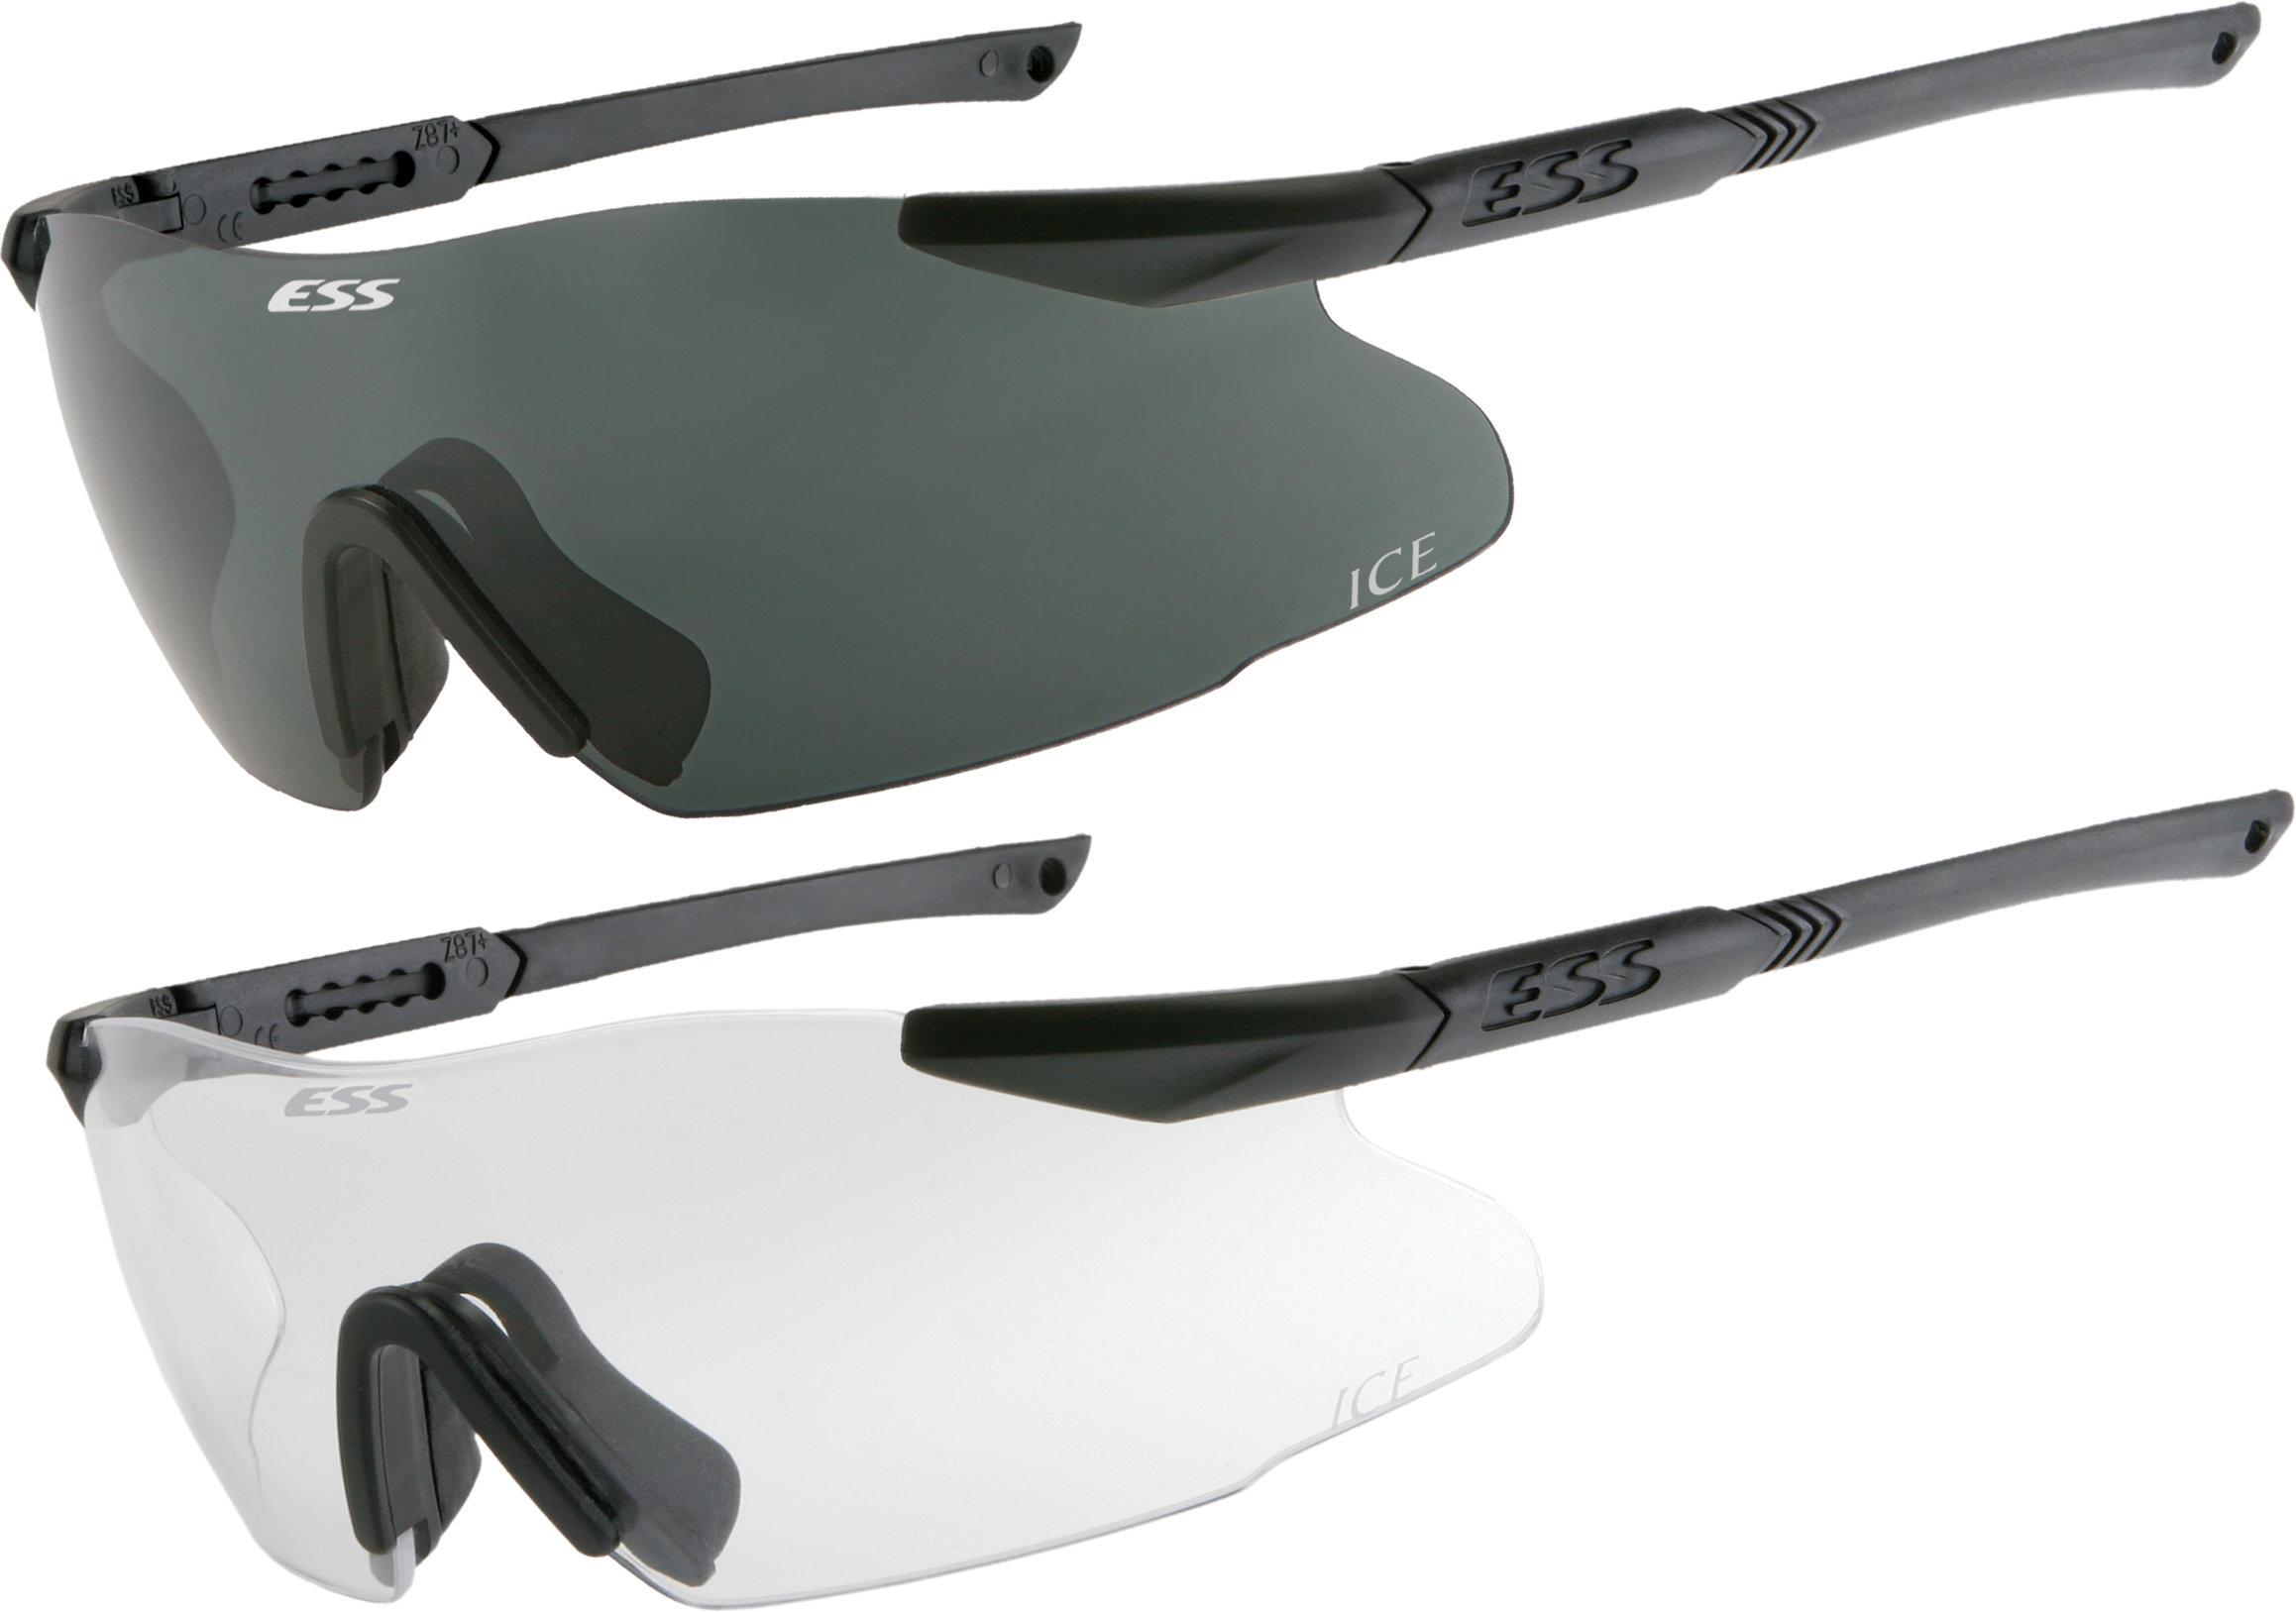 USGI Military ESS Ice Naro Ballistic Shooting Safety Glasses w// Dark Lens MINT